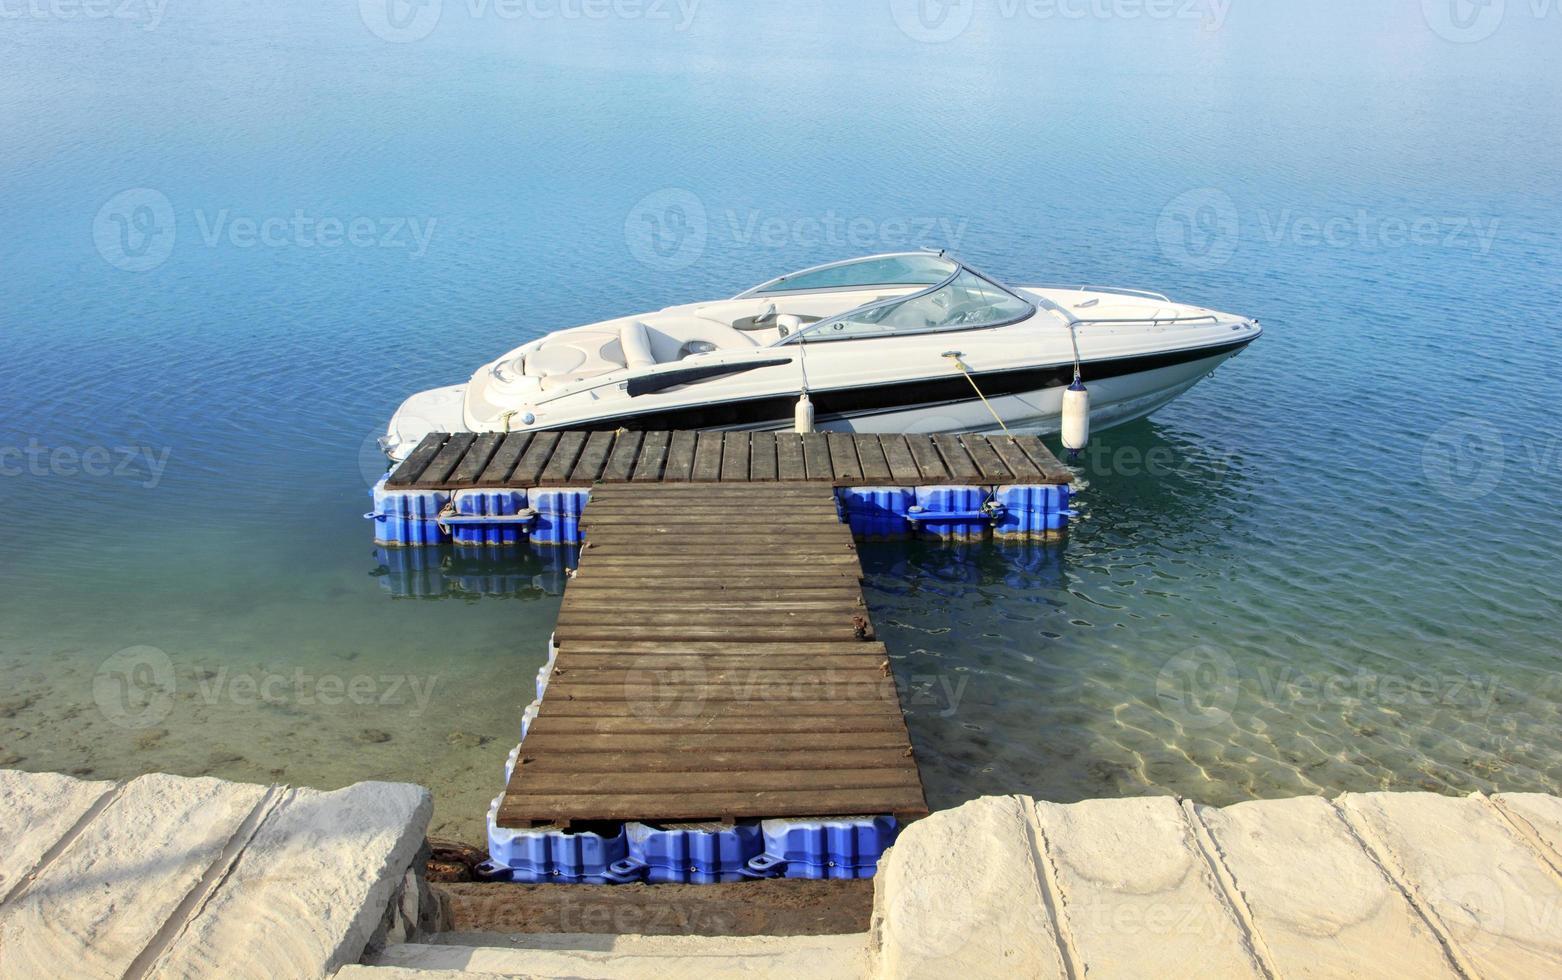 barco a motor ancorado foto